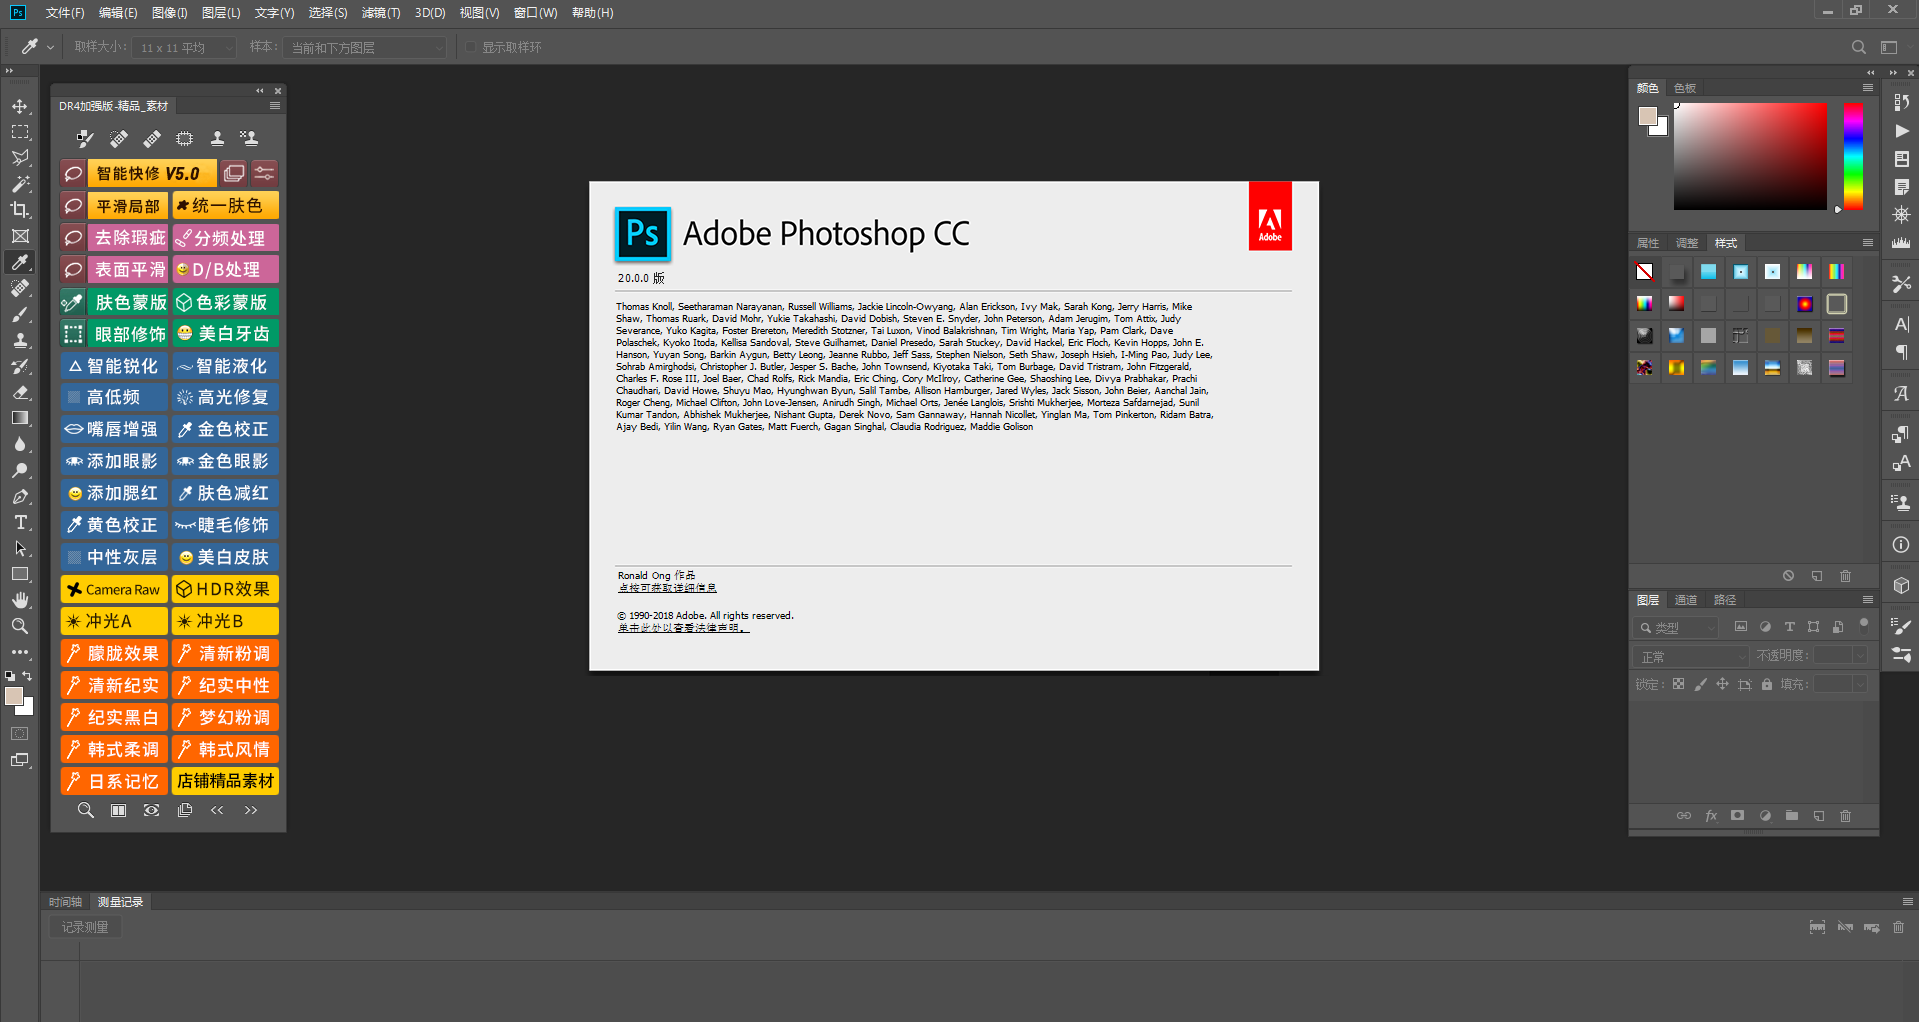 PS滤镜修图插件 DR4.5加强版集精修磨皮调色光效 完美支持PS CC 2019 Win和Mac版 + 详细安装说明 PS插件 Photoshop 第1张